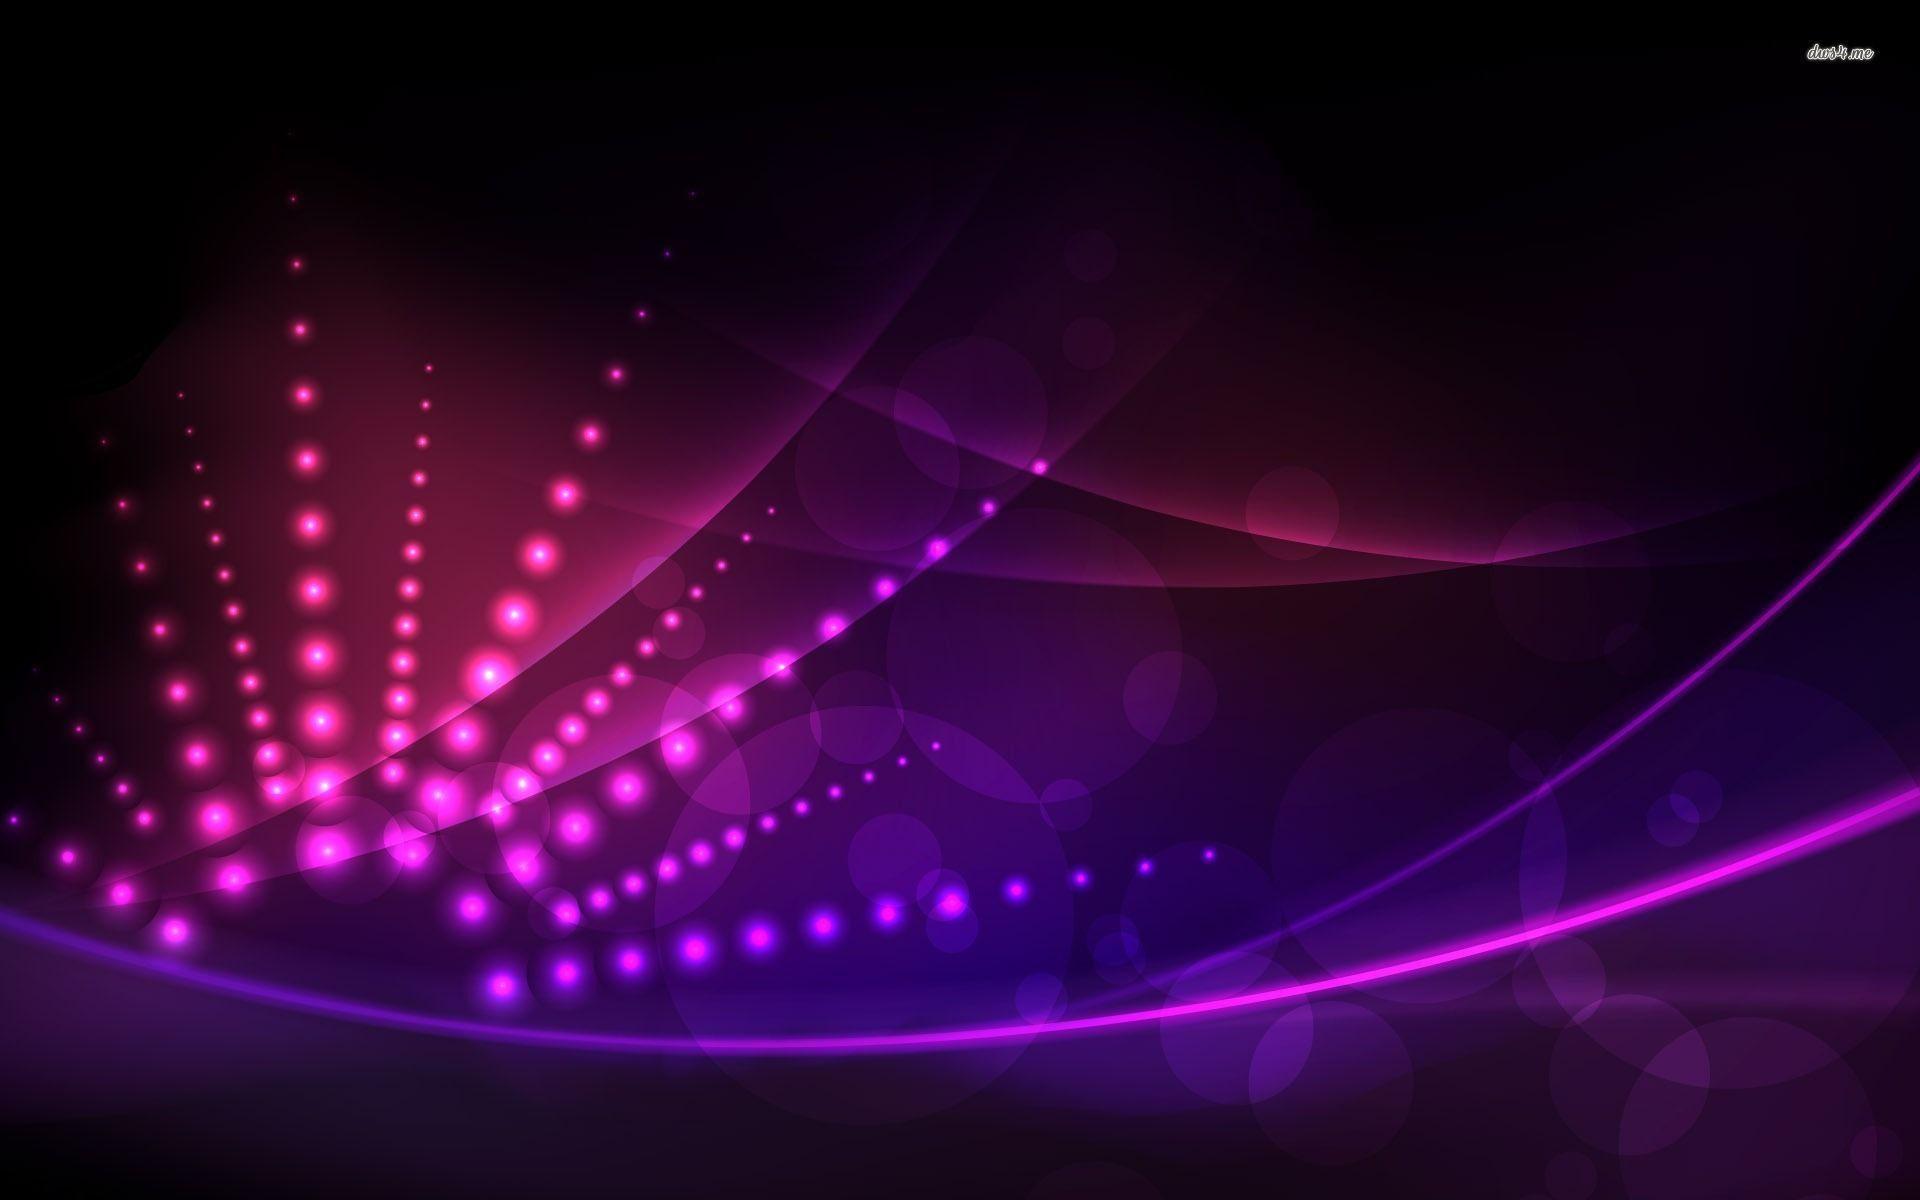 800 Wallpaper Abstract Purple HD